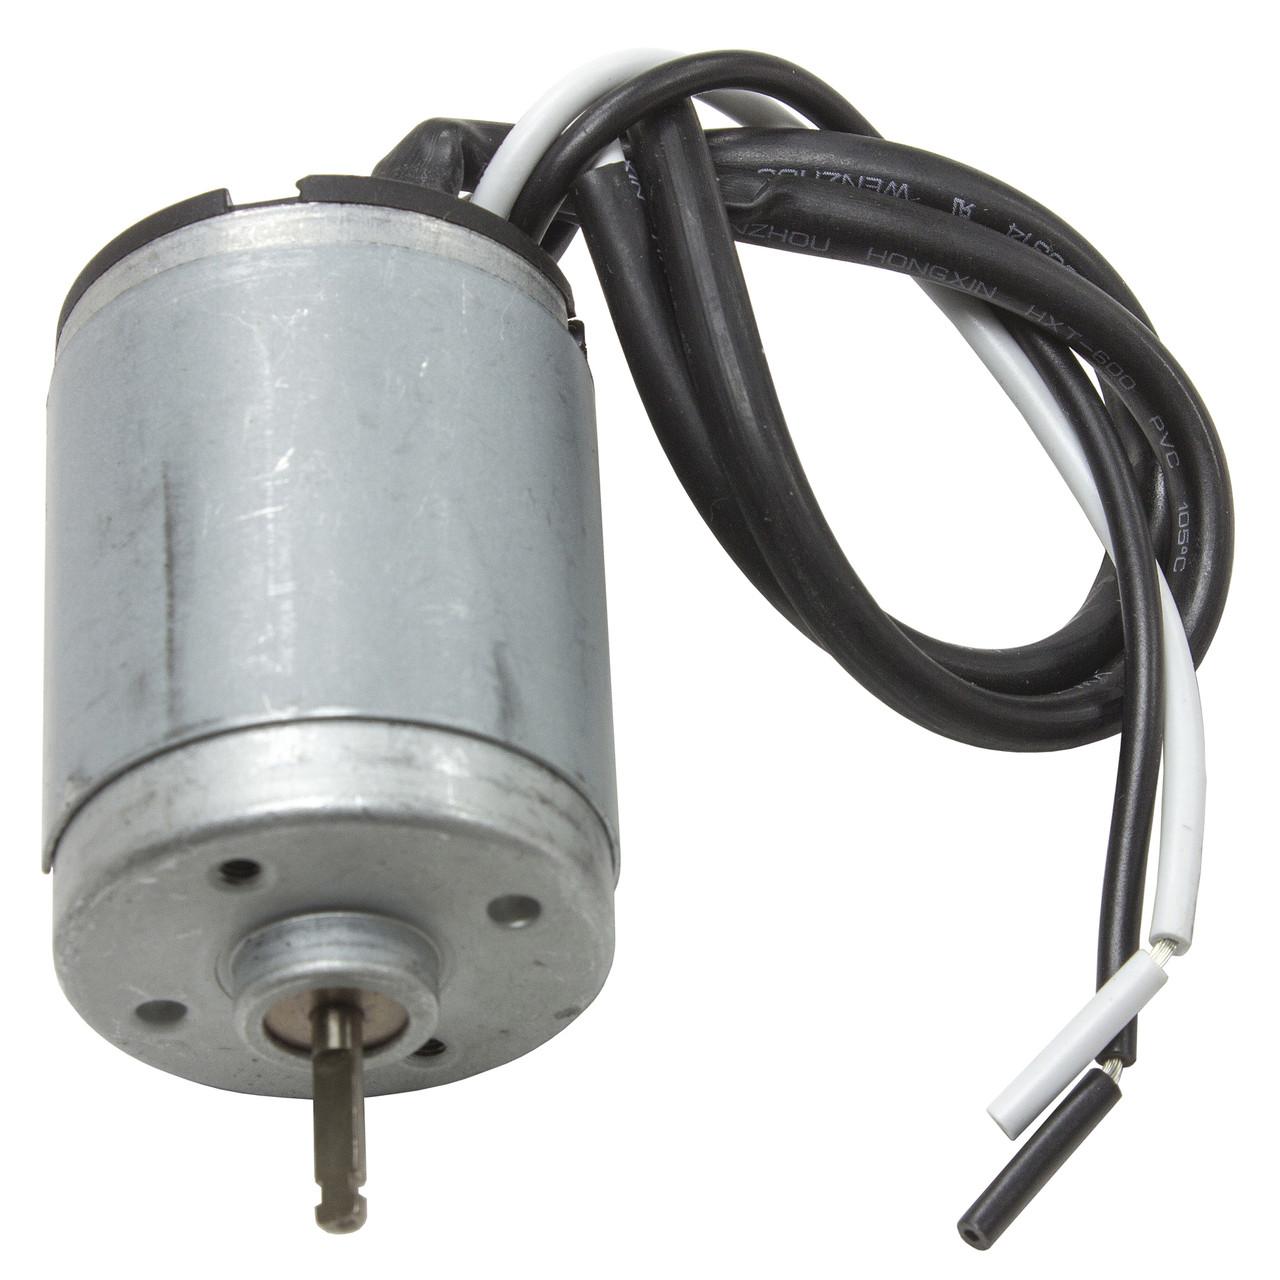 Heng's 12 Volt Replacement Vent Motor Jensen on accel ecm wire diagram, jensen din 8 pin, jensen tools, jensen vm9312 wiring, jensen speaker, jensen cd3010x wiring harness,